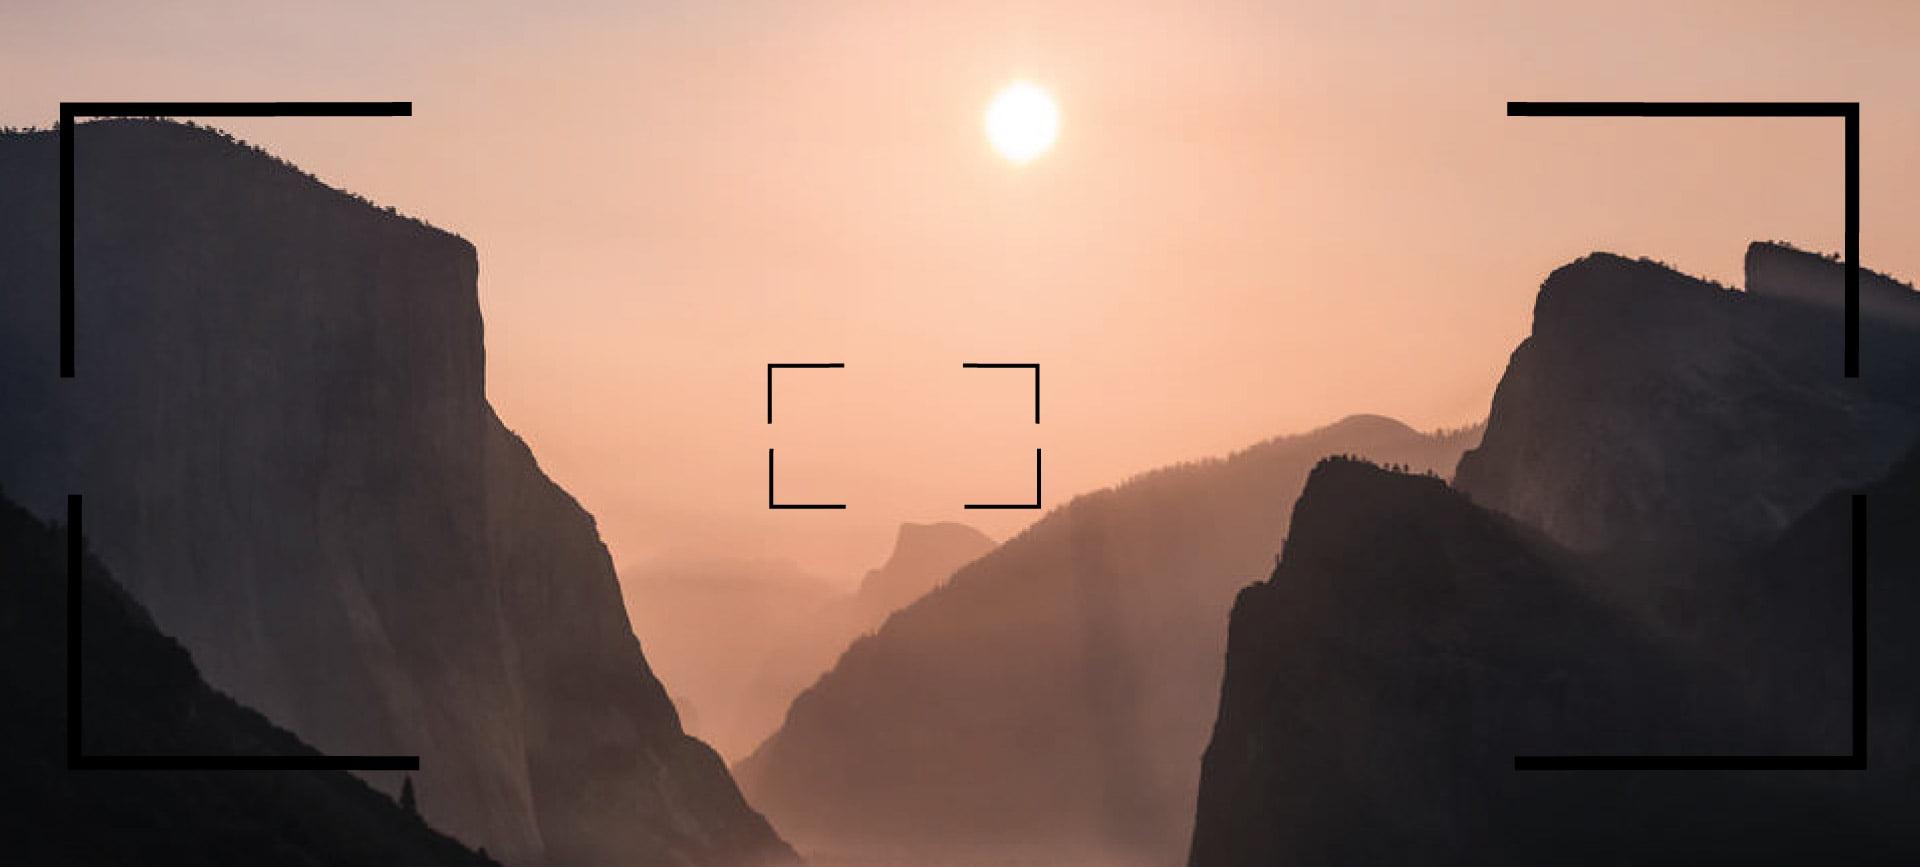 distance in photography compostion 2 - عناصر ترکیب بندی در عکاسی